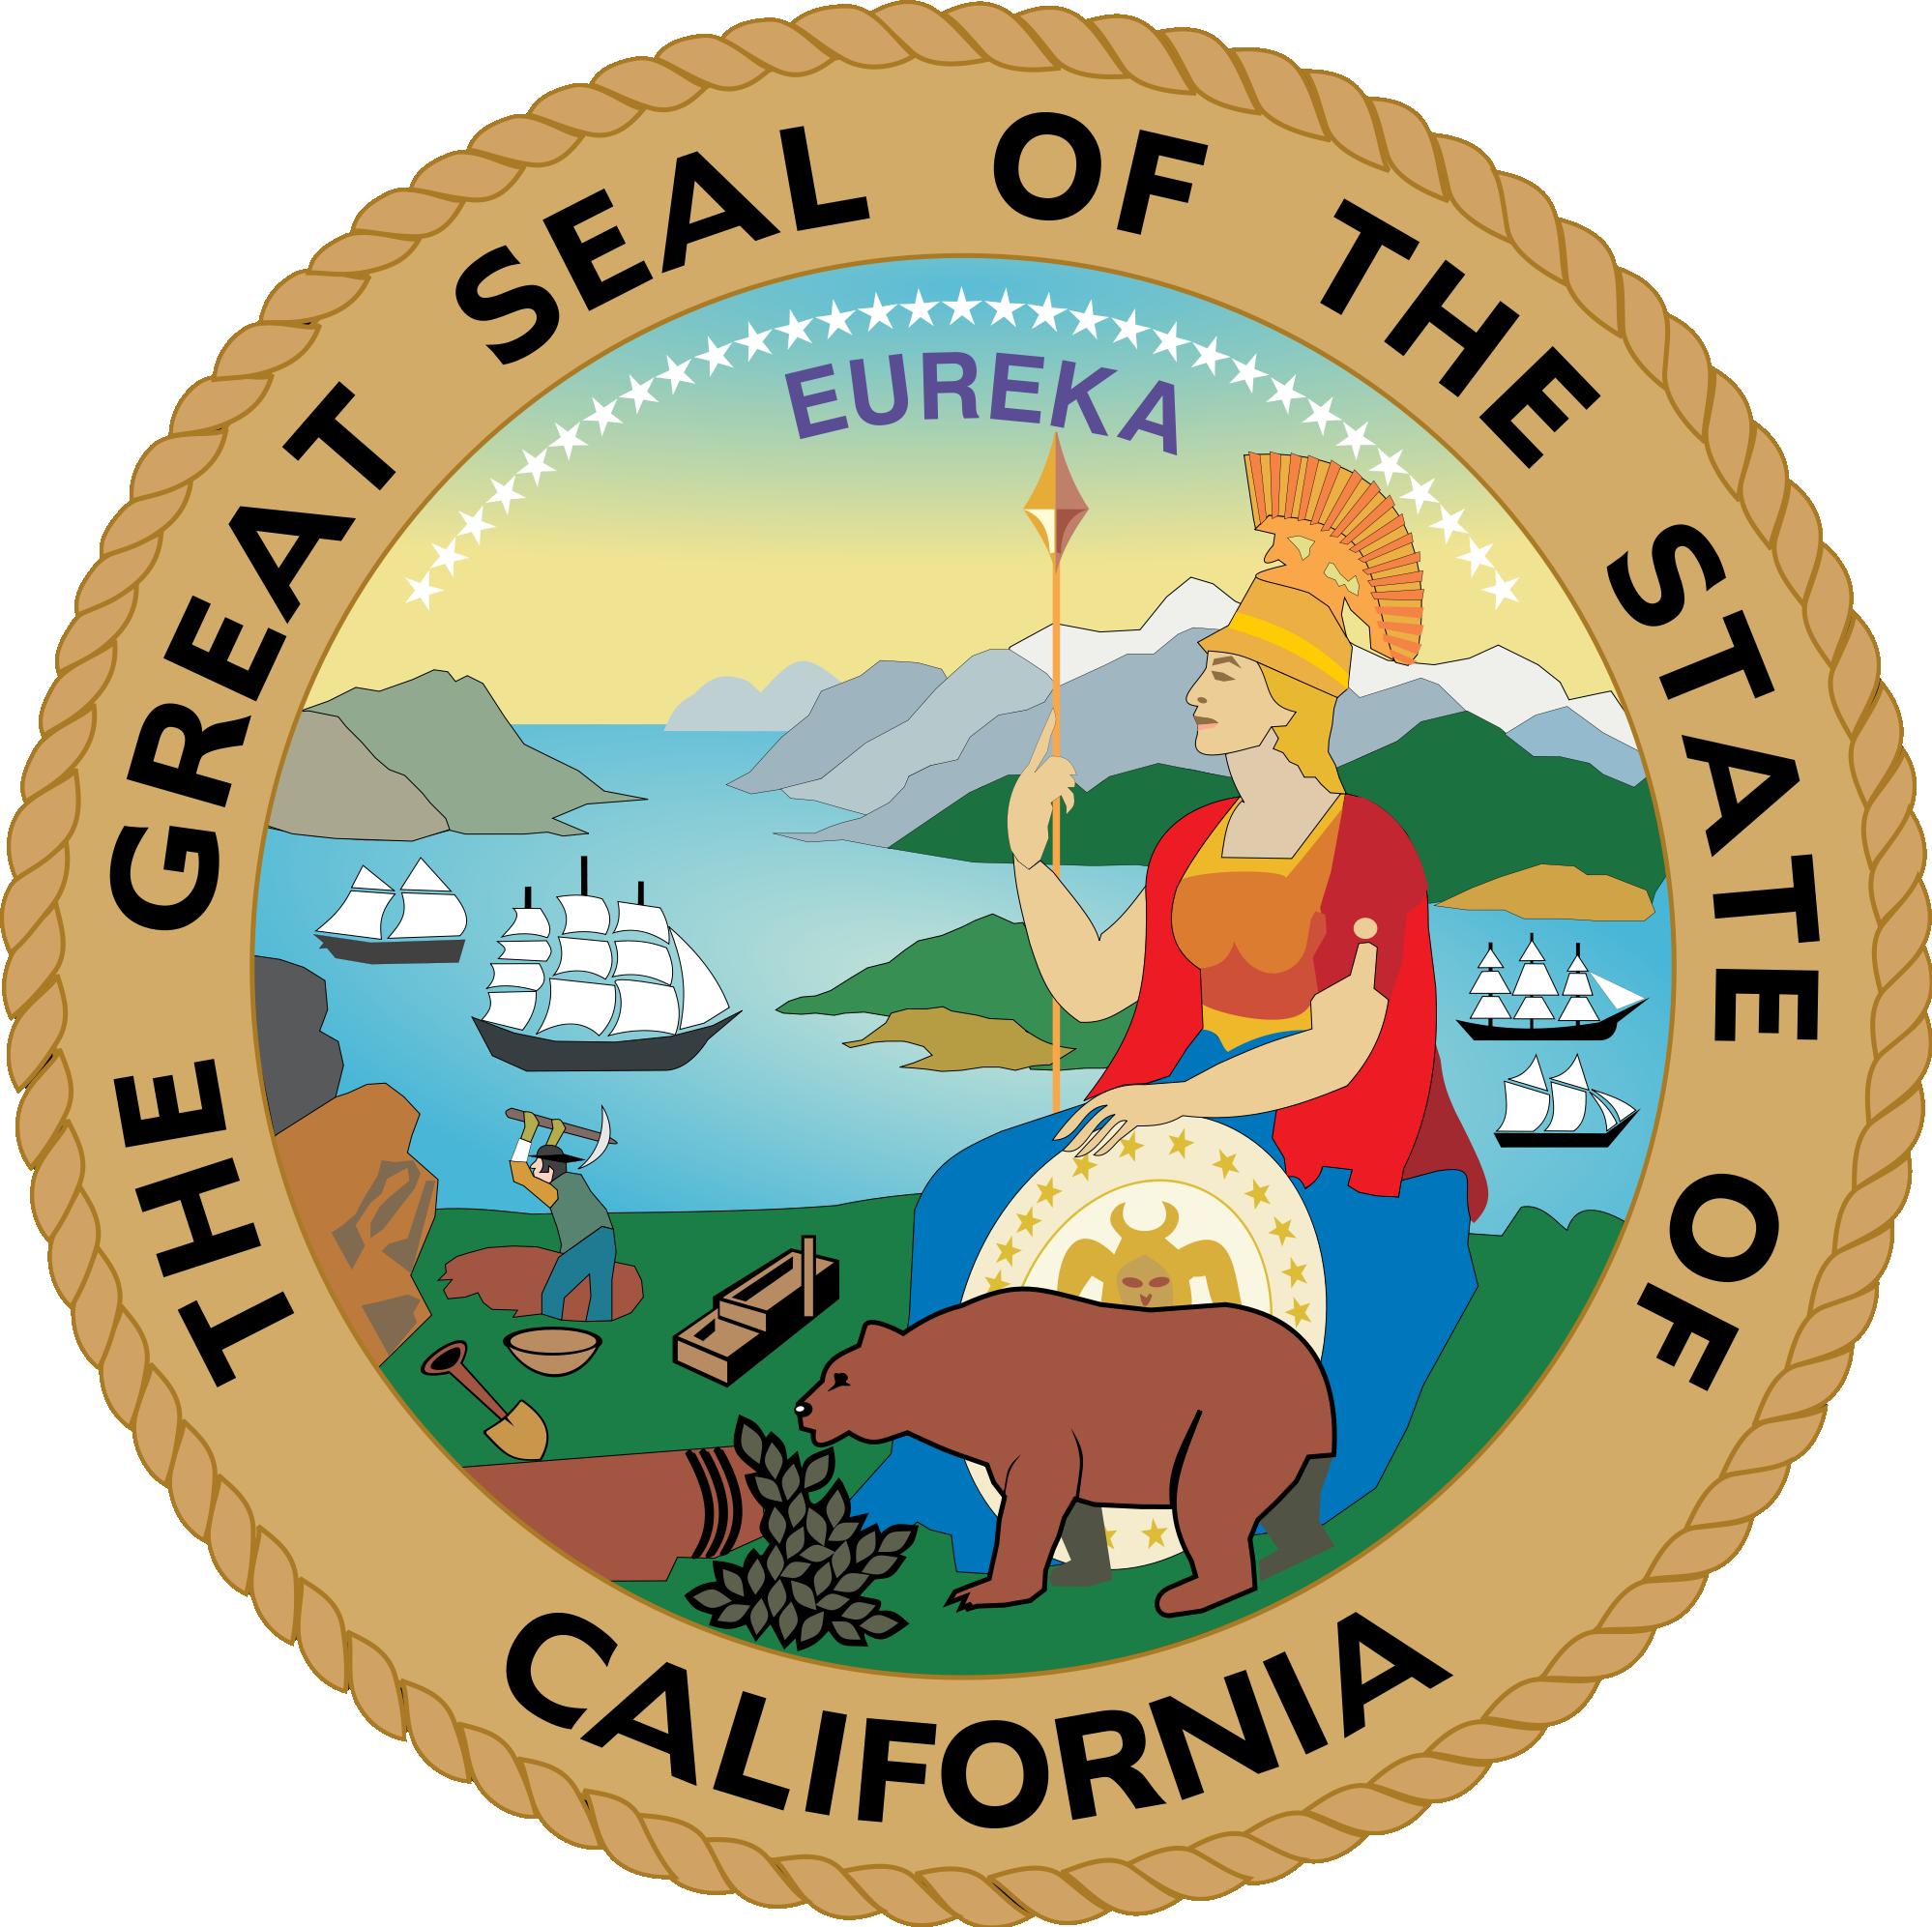 seal-california-image-1500x1500.png